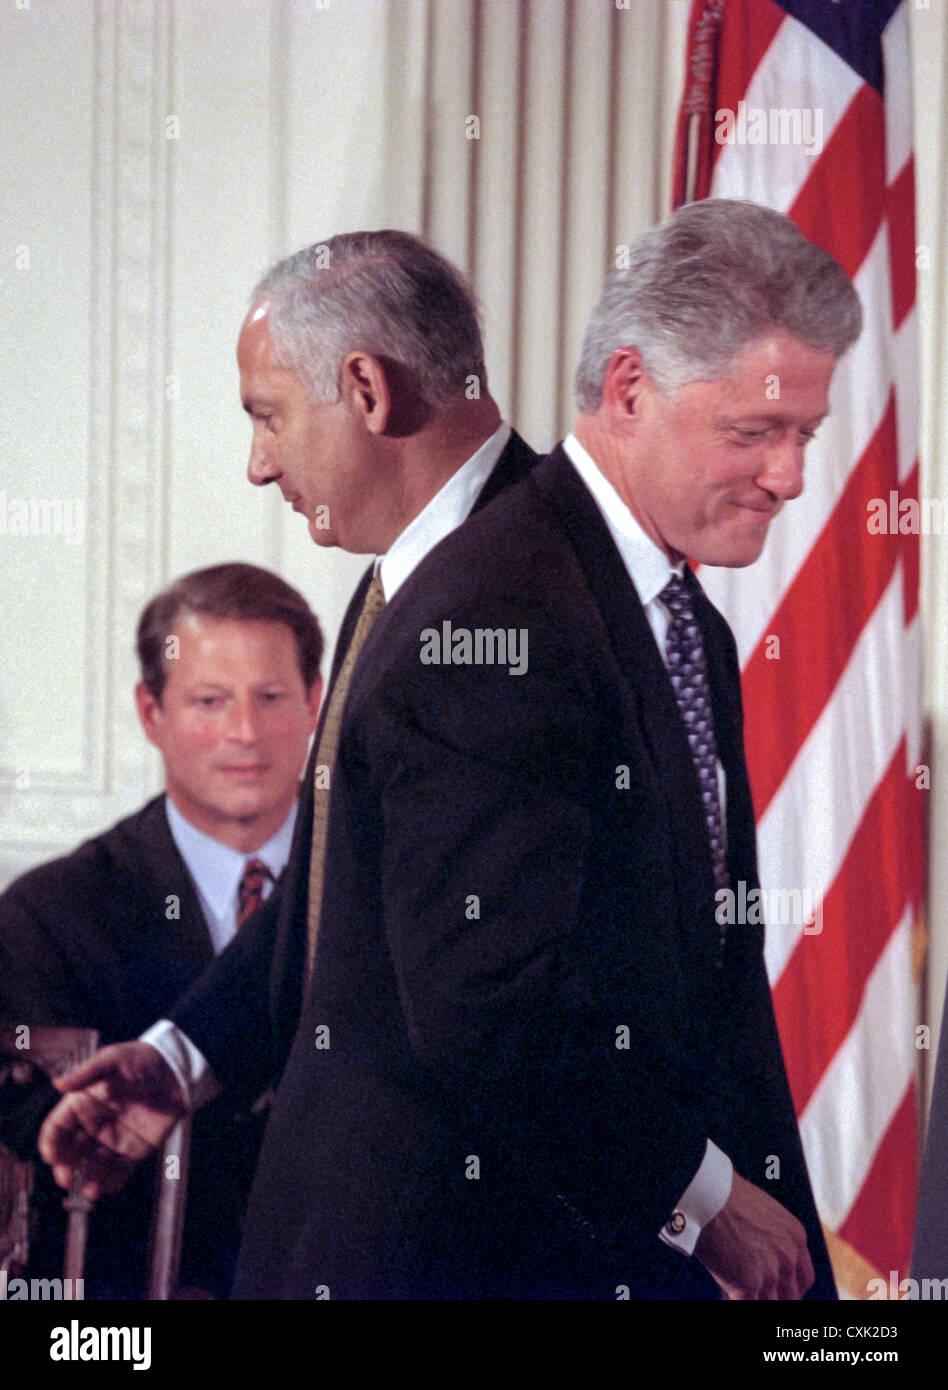 Us President Bill Clinton Passes Israel Prime Minister Benjamin